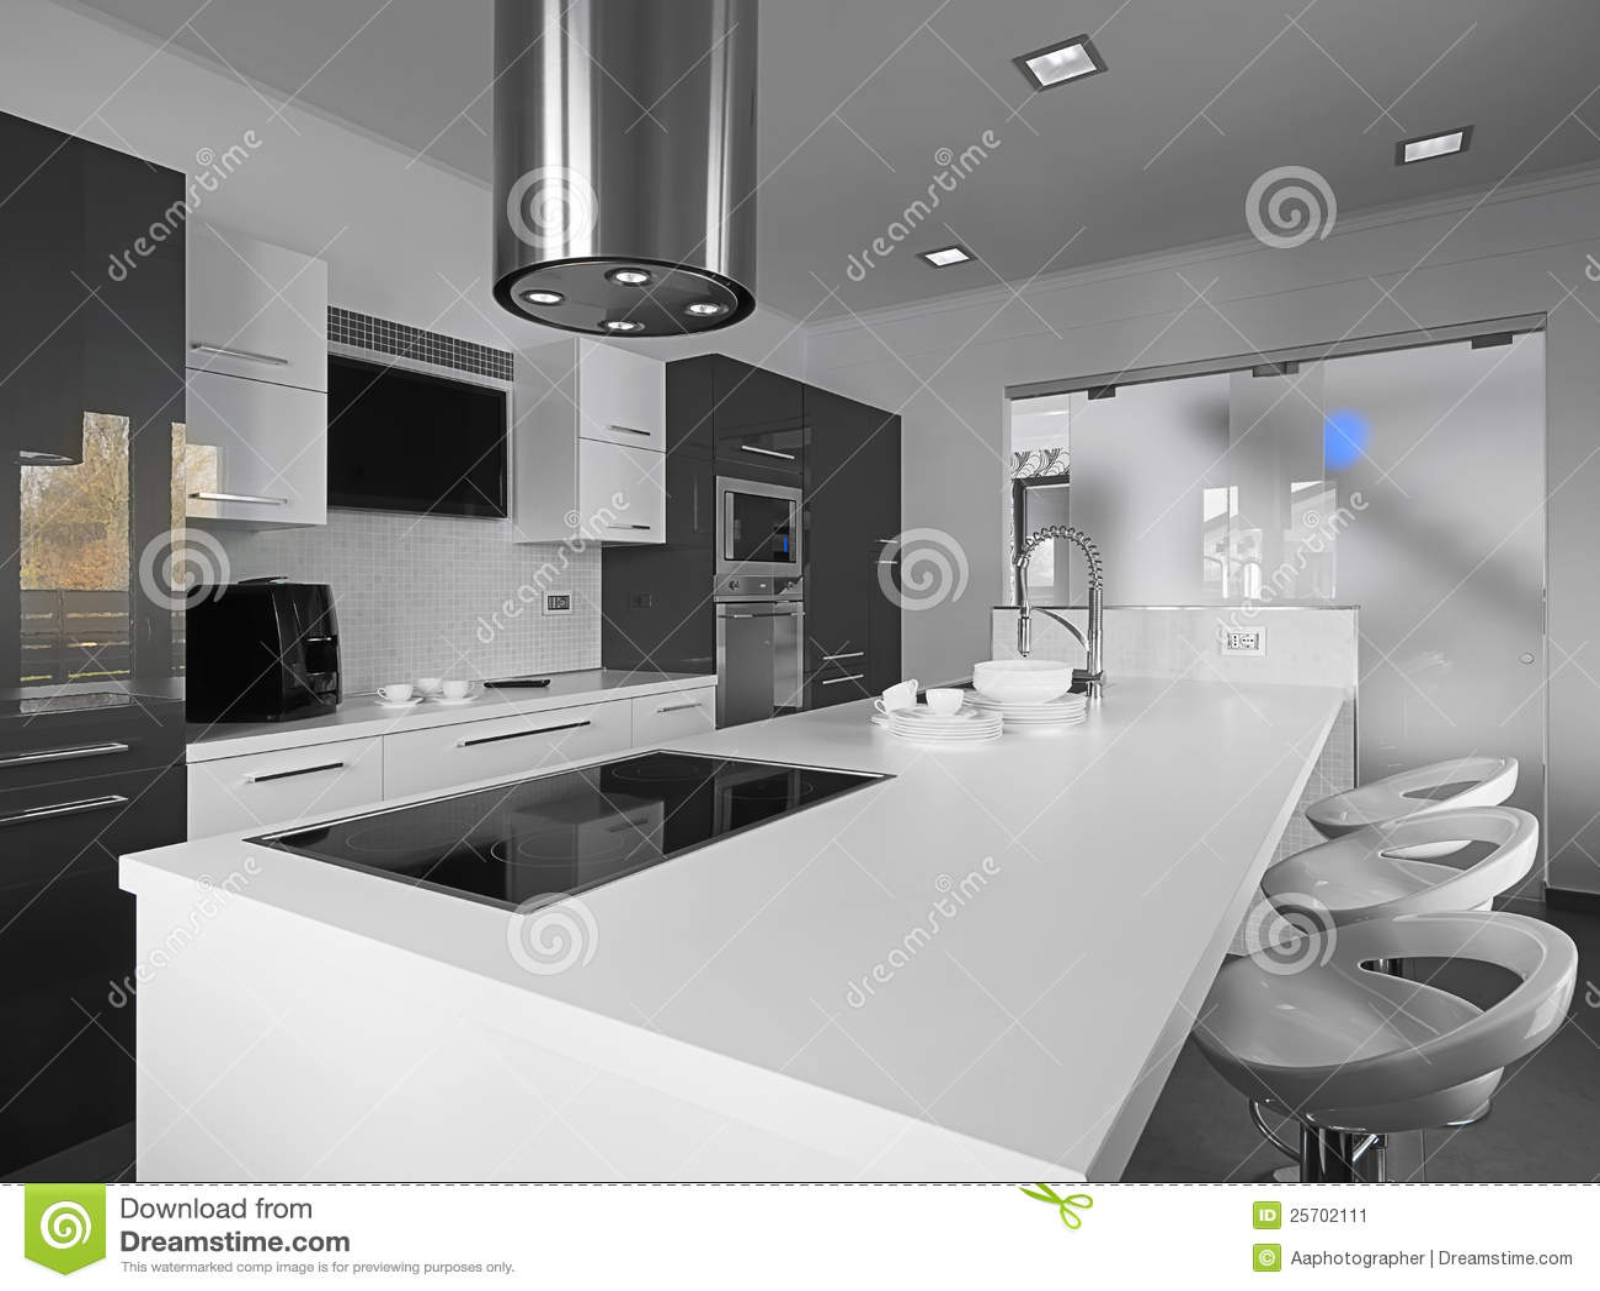 Cuisine moderne en noir et blanc image stock image 25702111 - Cuisine en noir et blanc ...